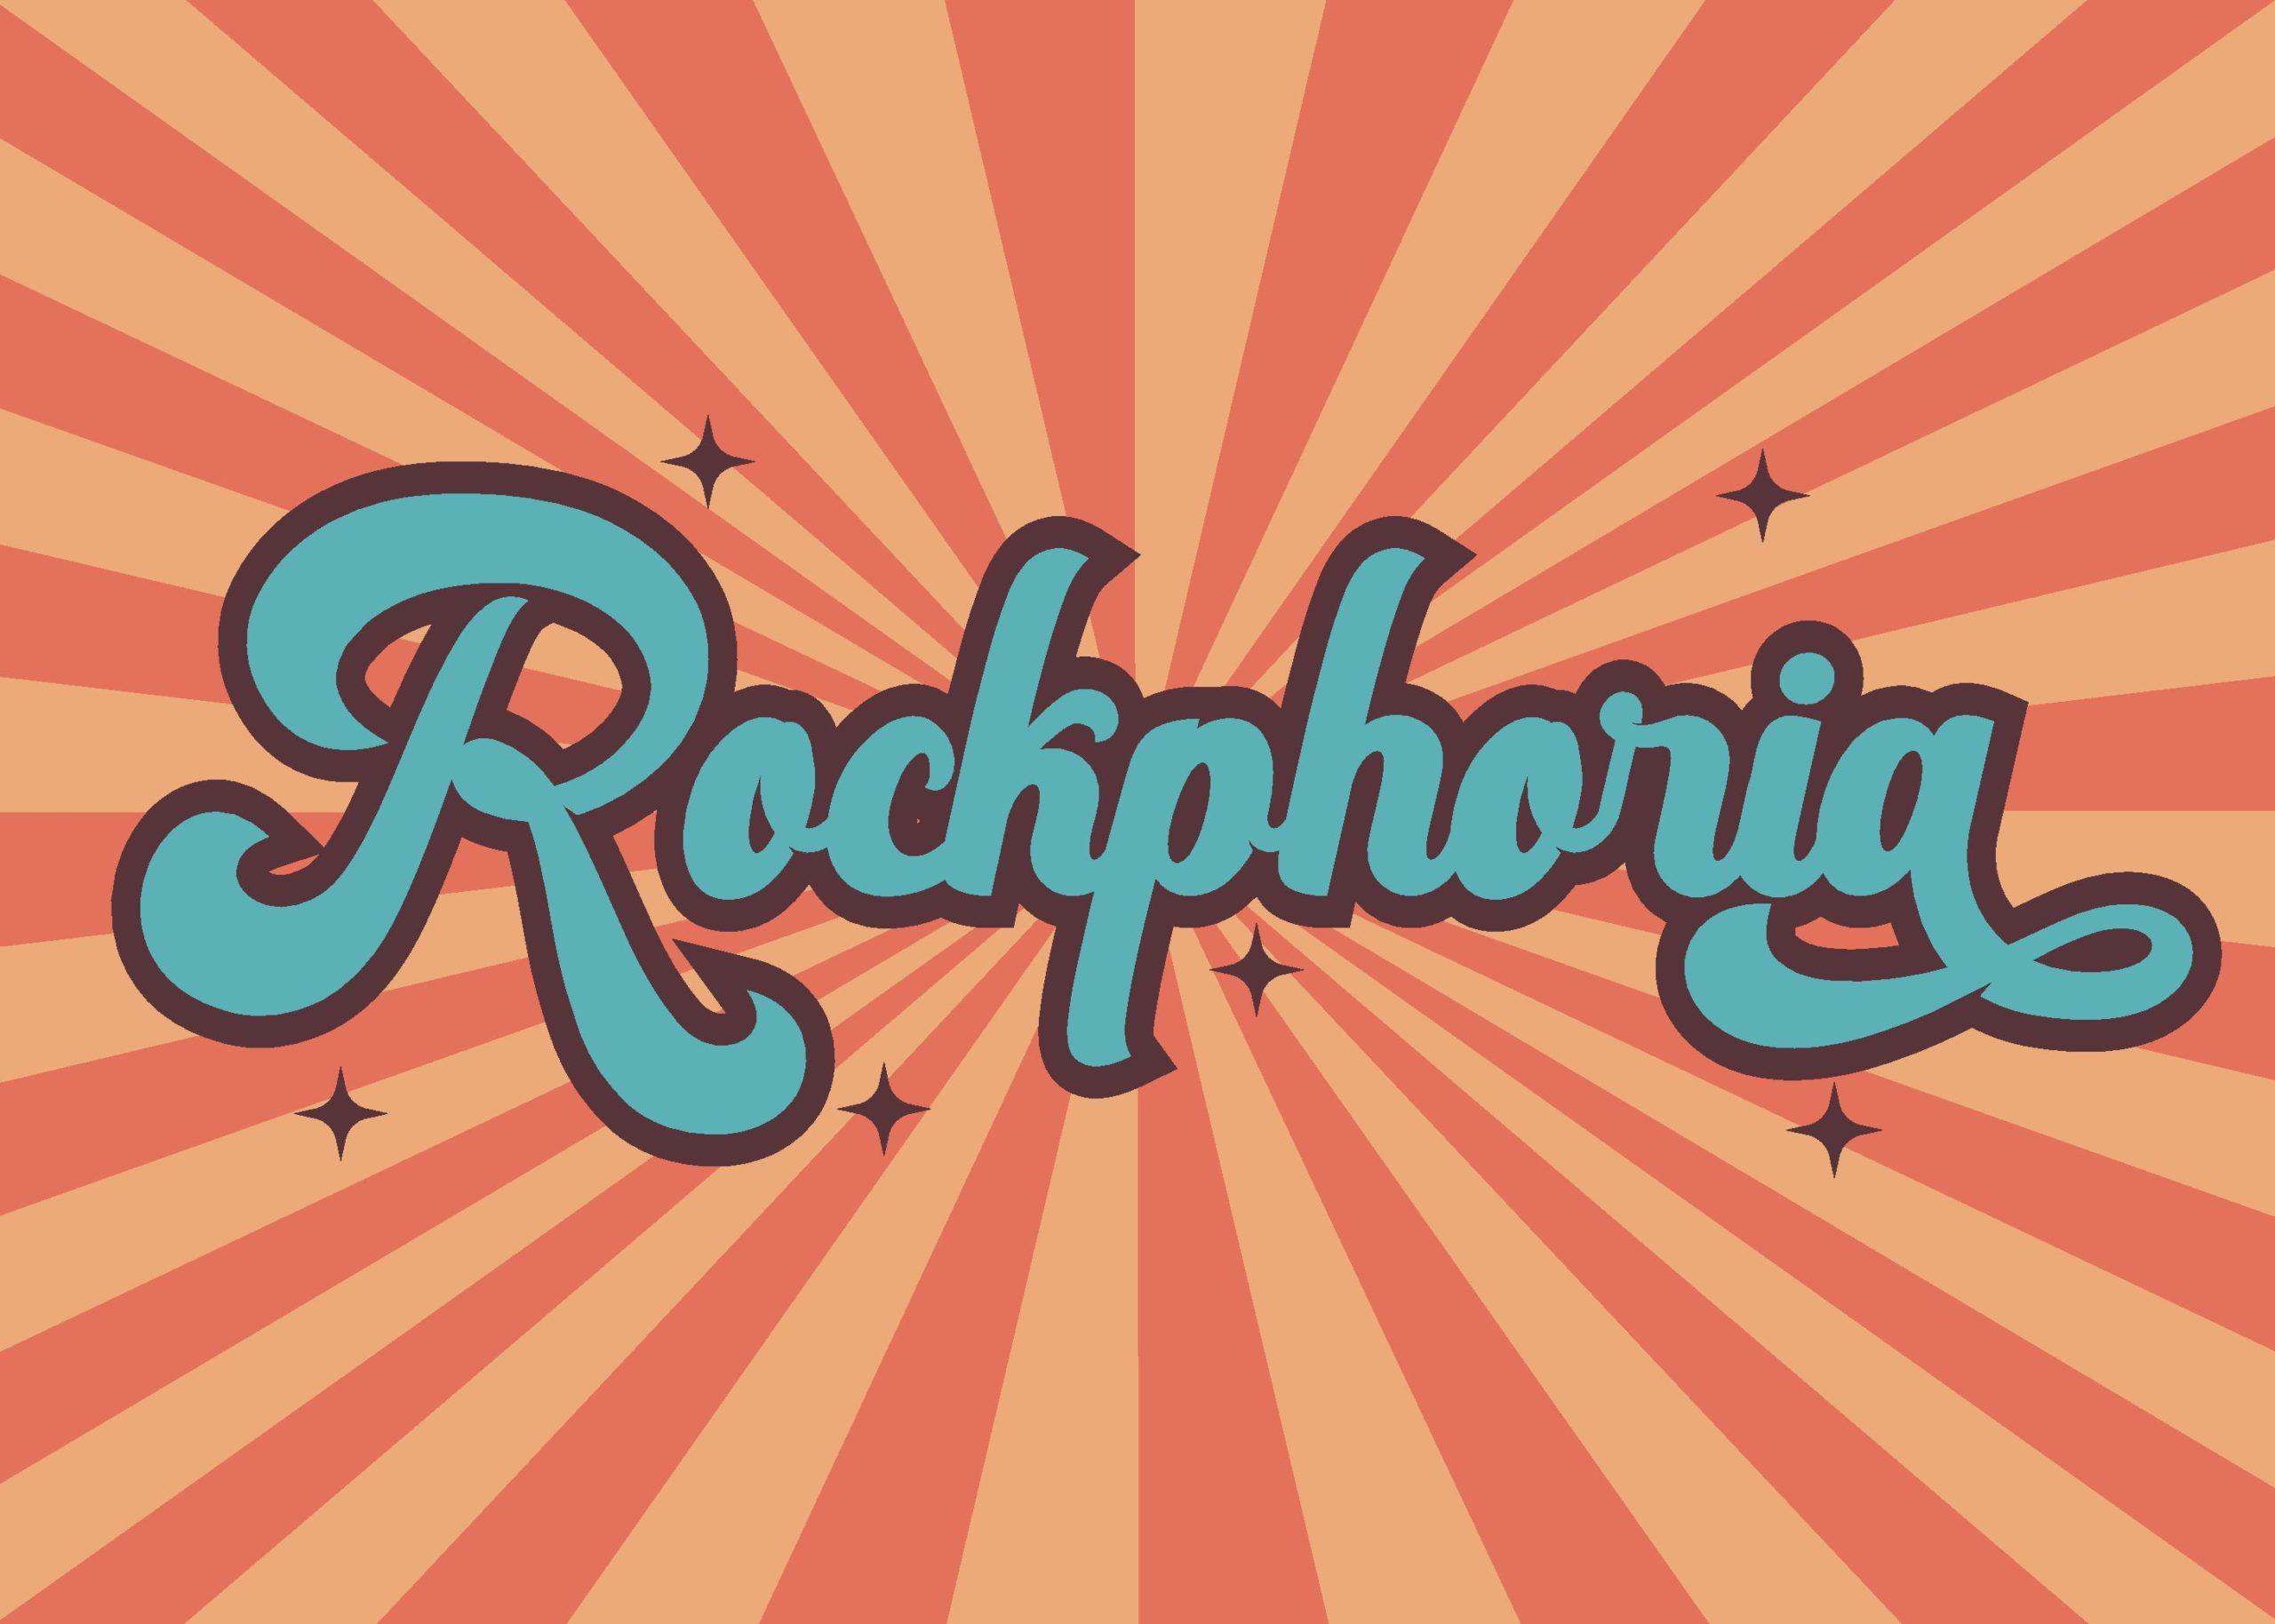 About Rockphoria News